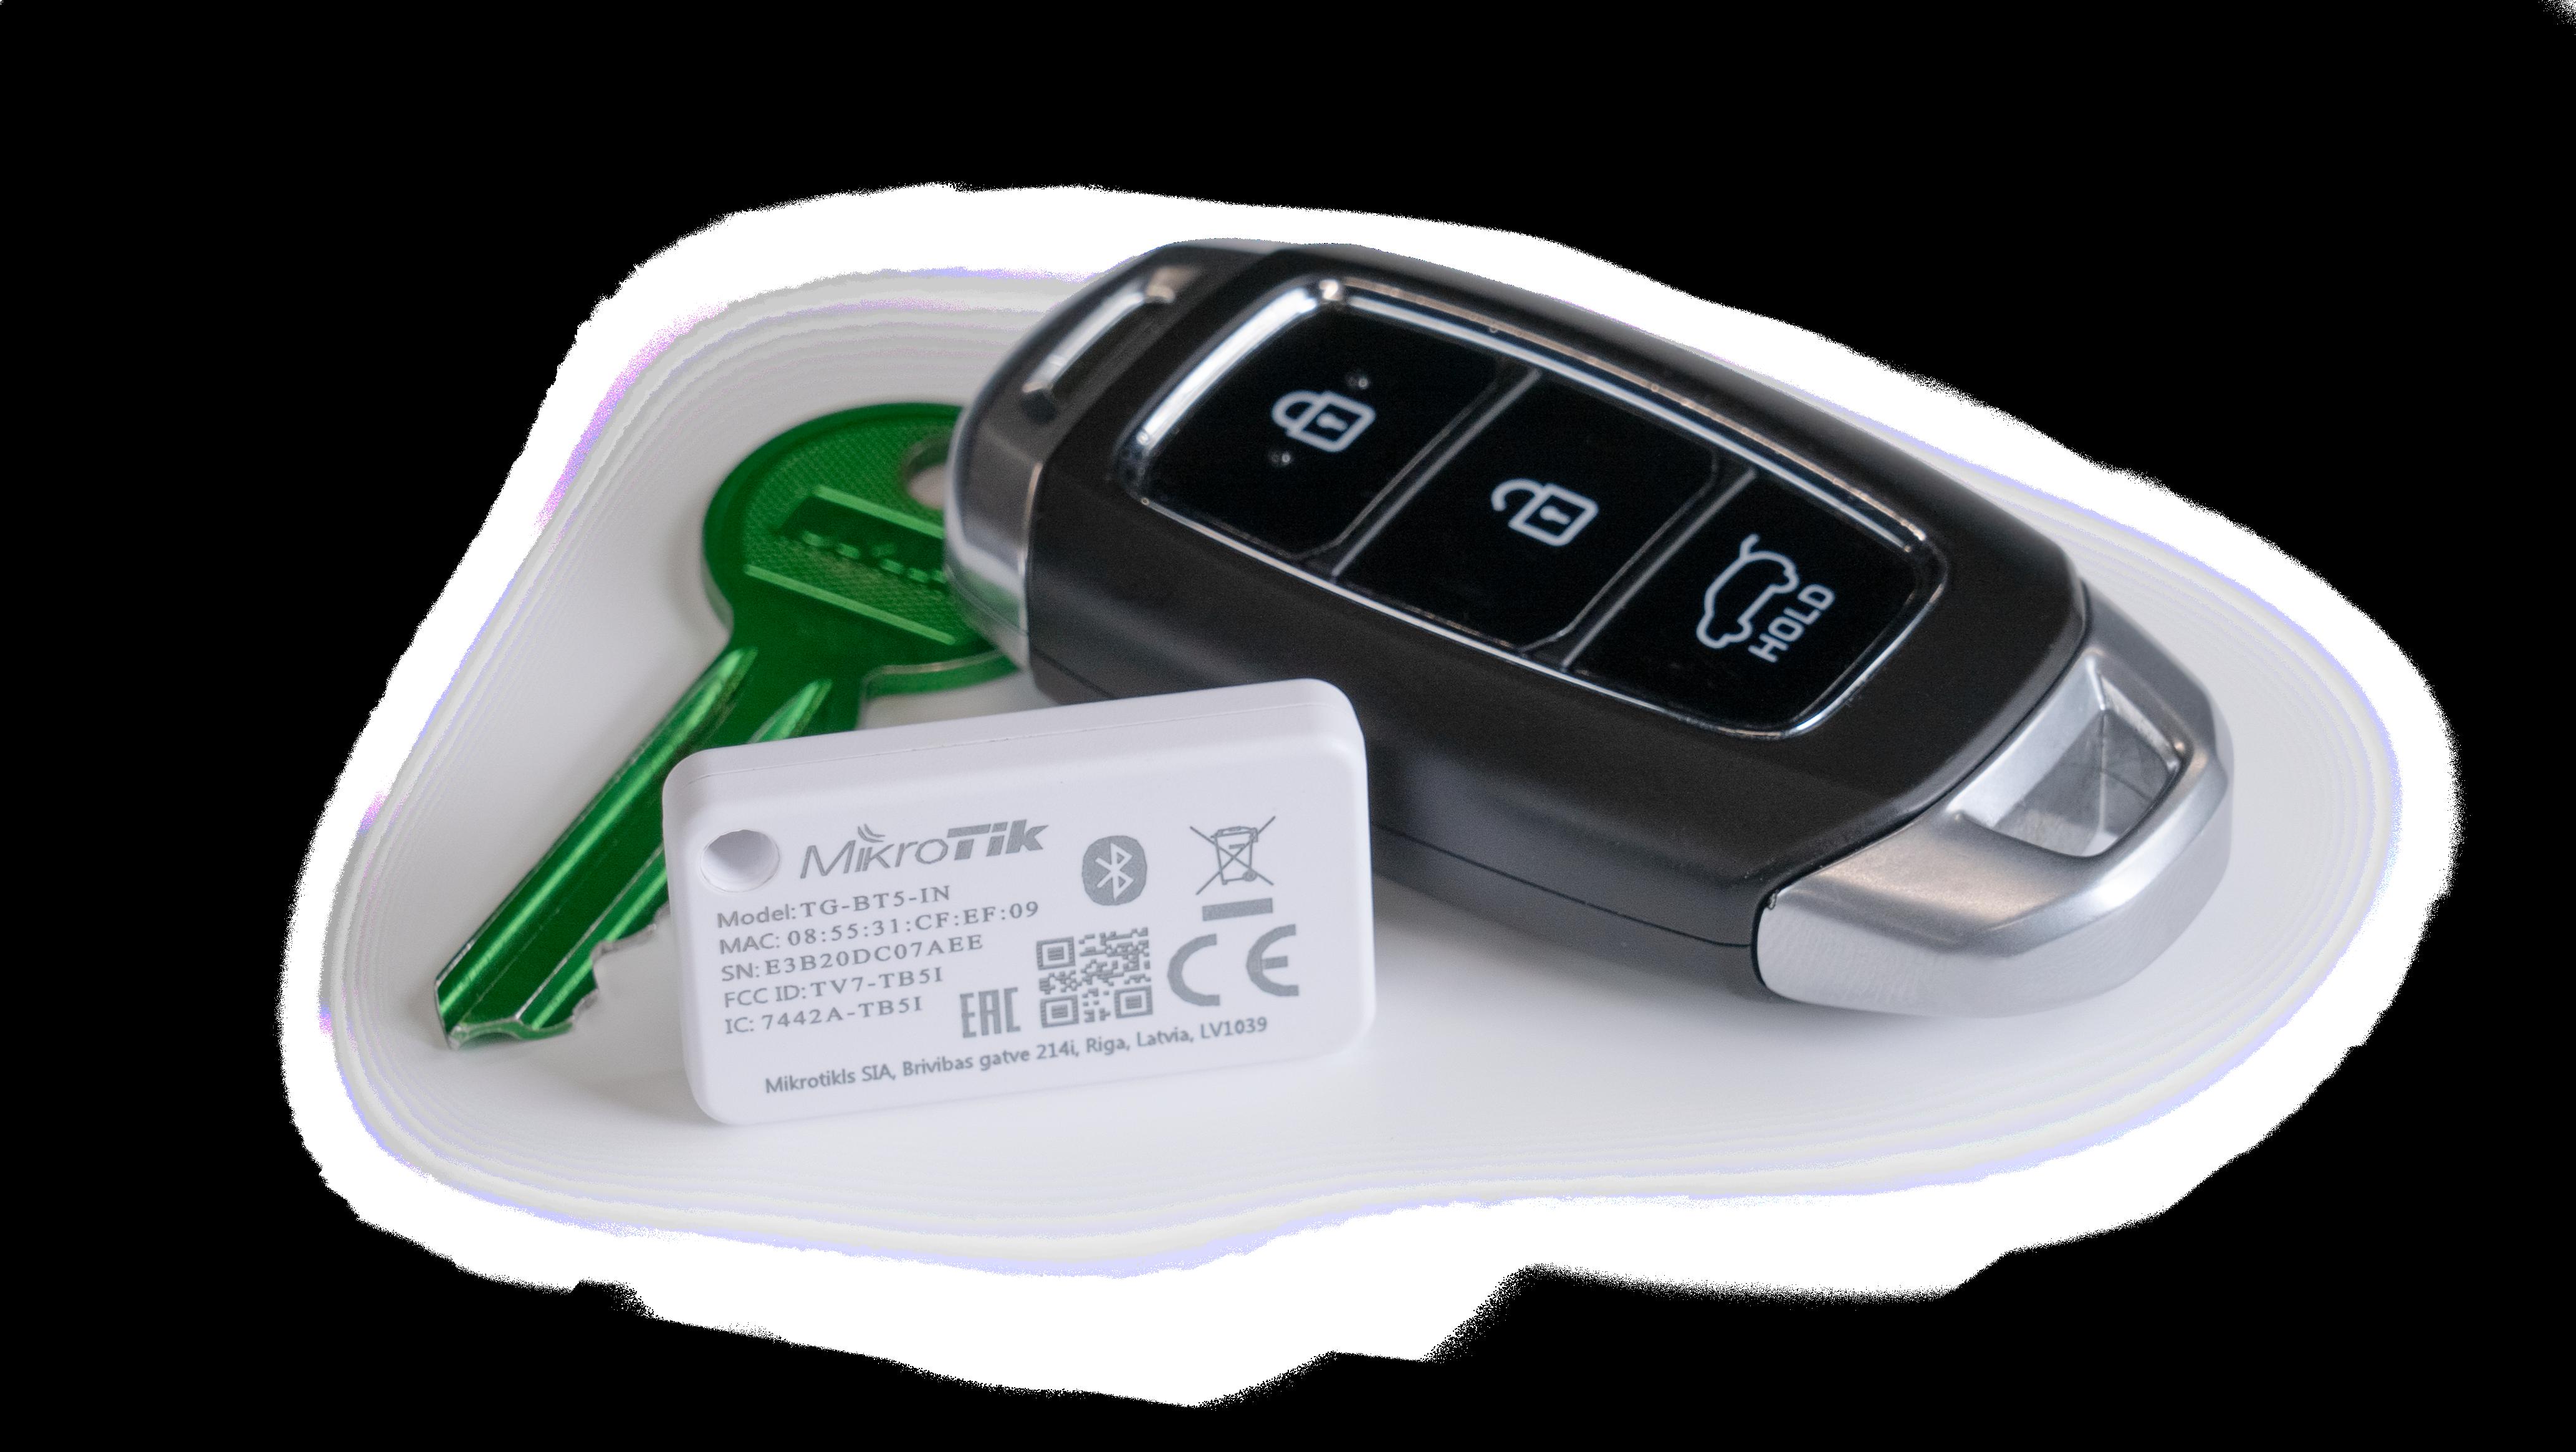 TG-BT5-IN TG-BT5-IN Bluetooth indoor tag / key